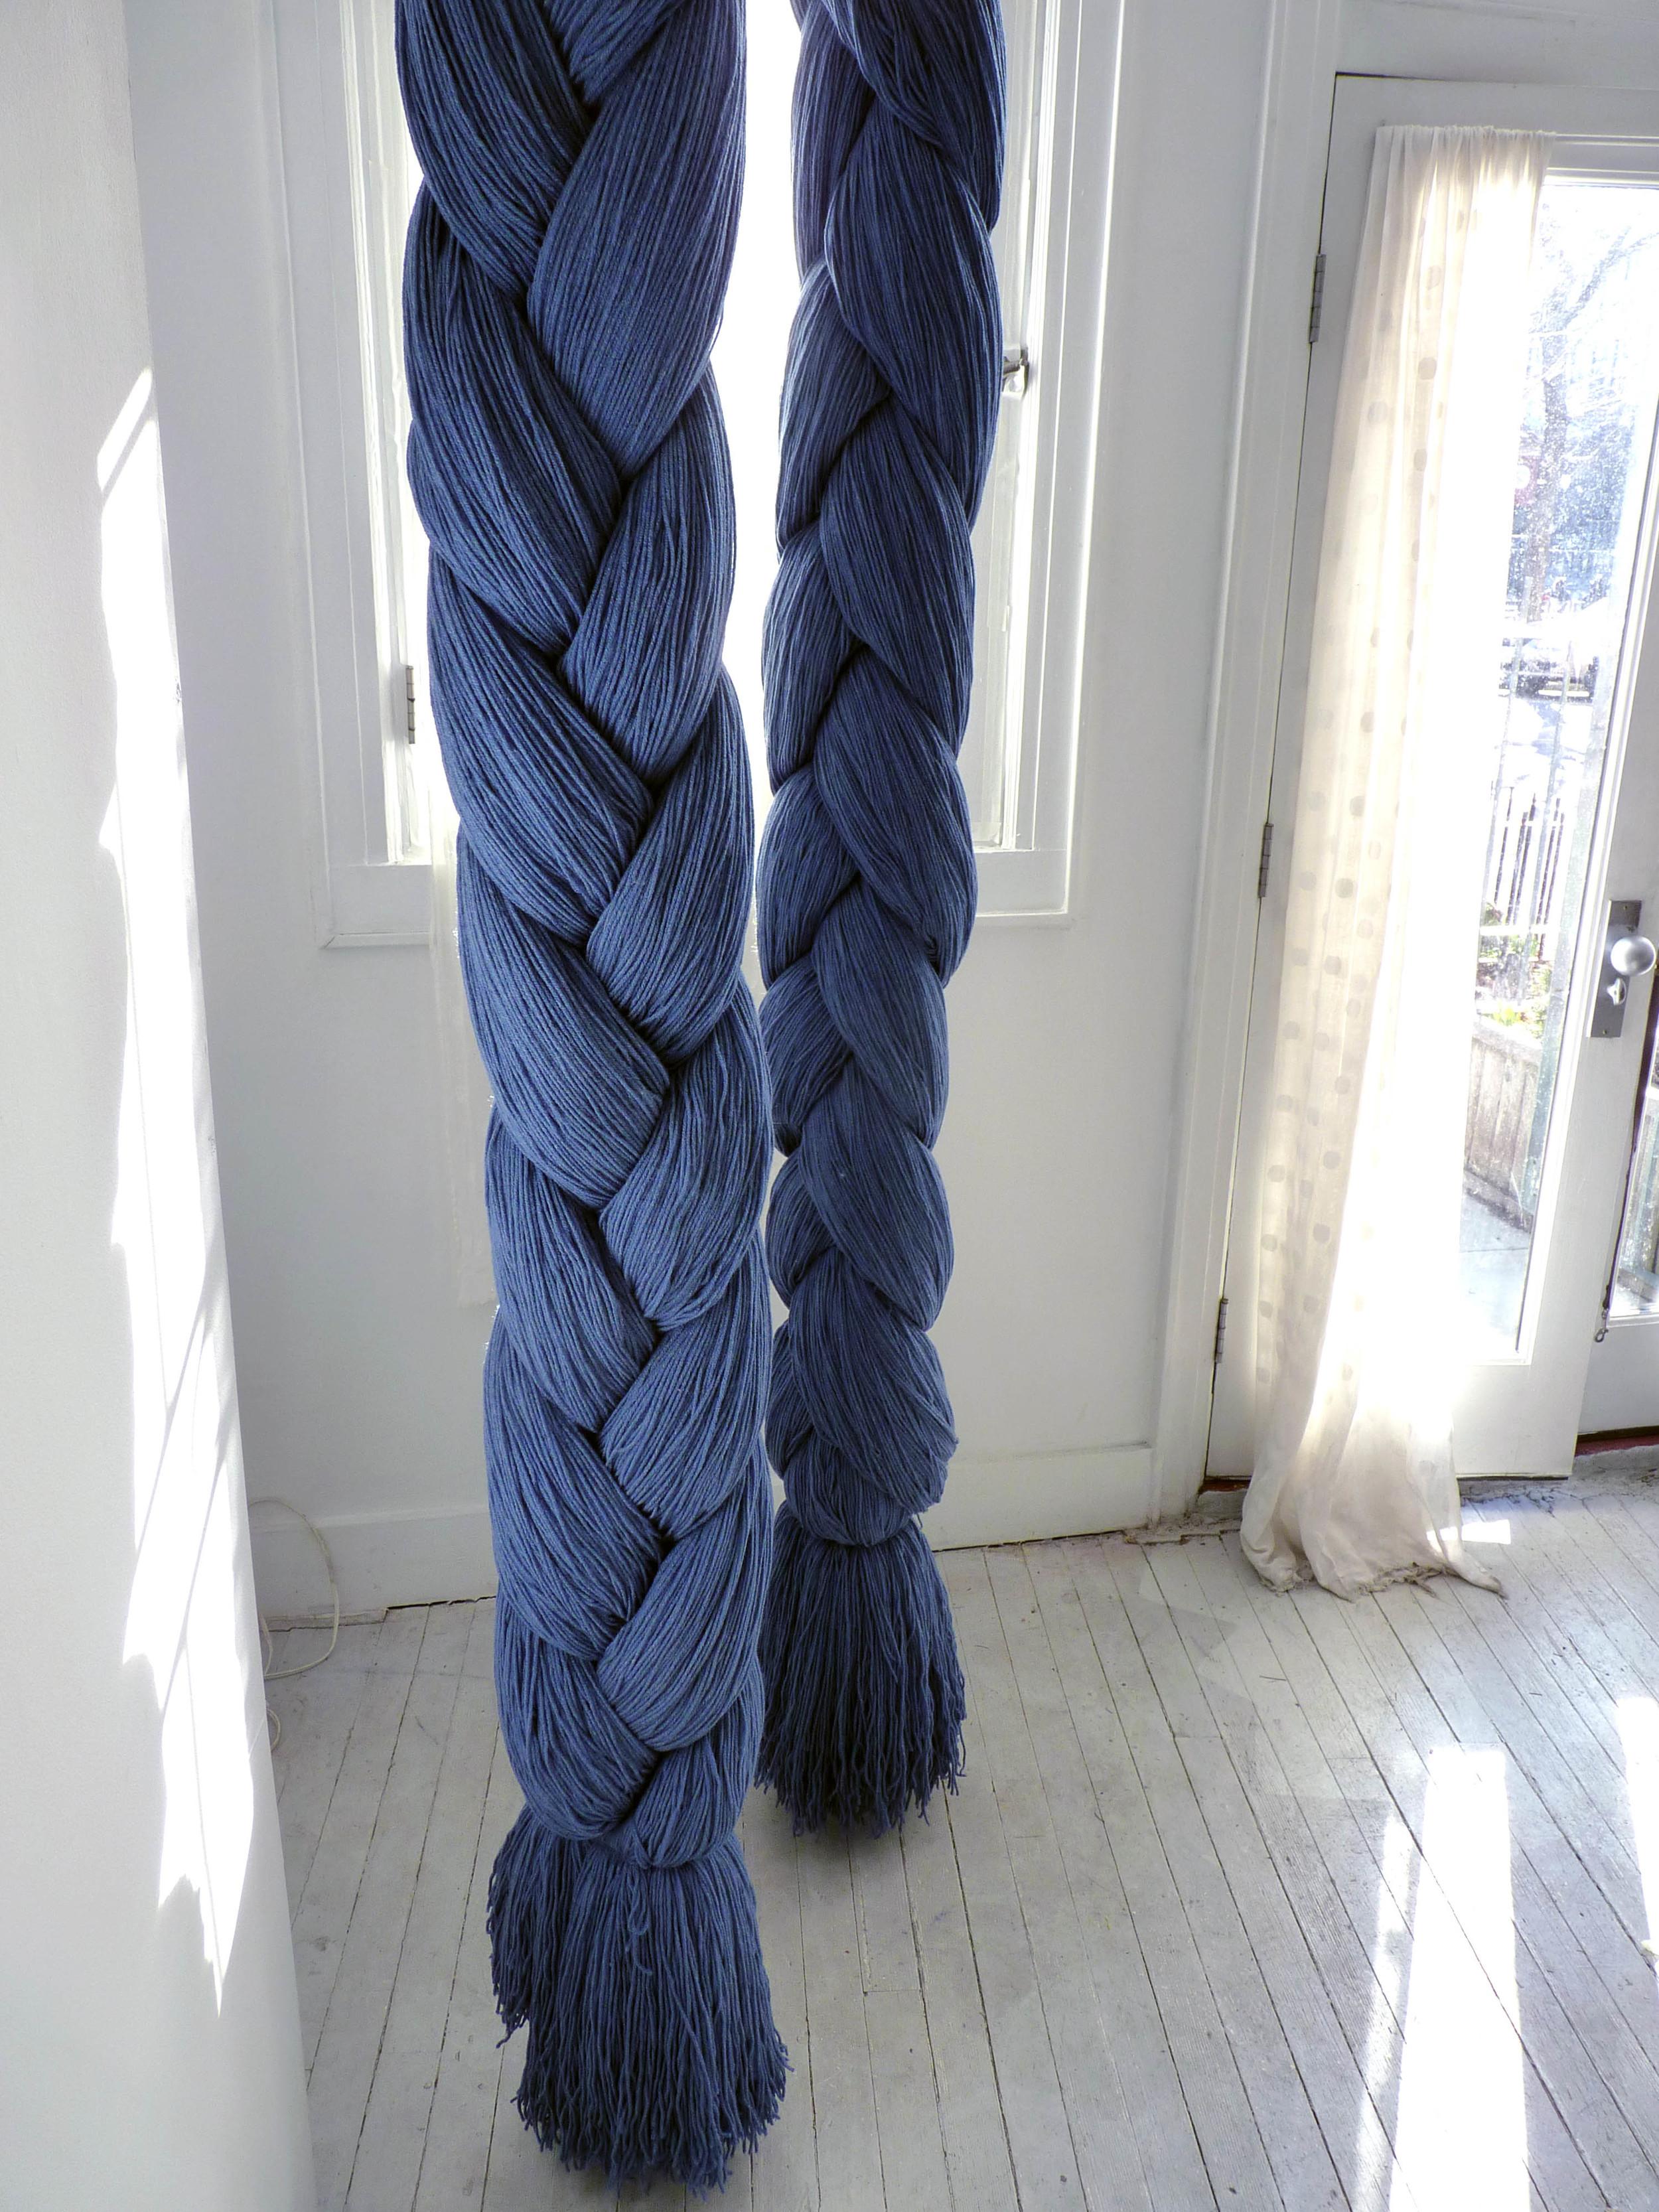 Laura, 2005-11, Acrylic Yarn, hardware, 3 x 4 x 9 feet (Detail)